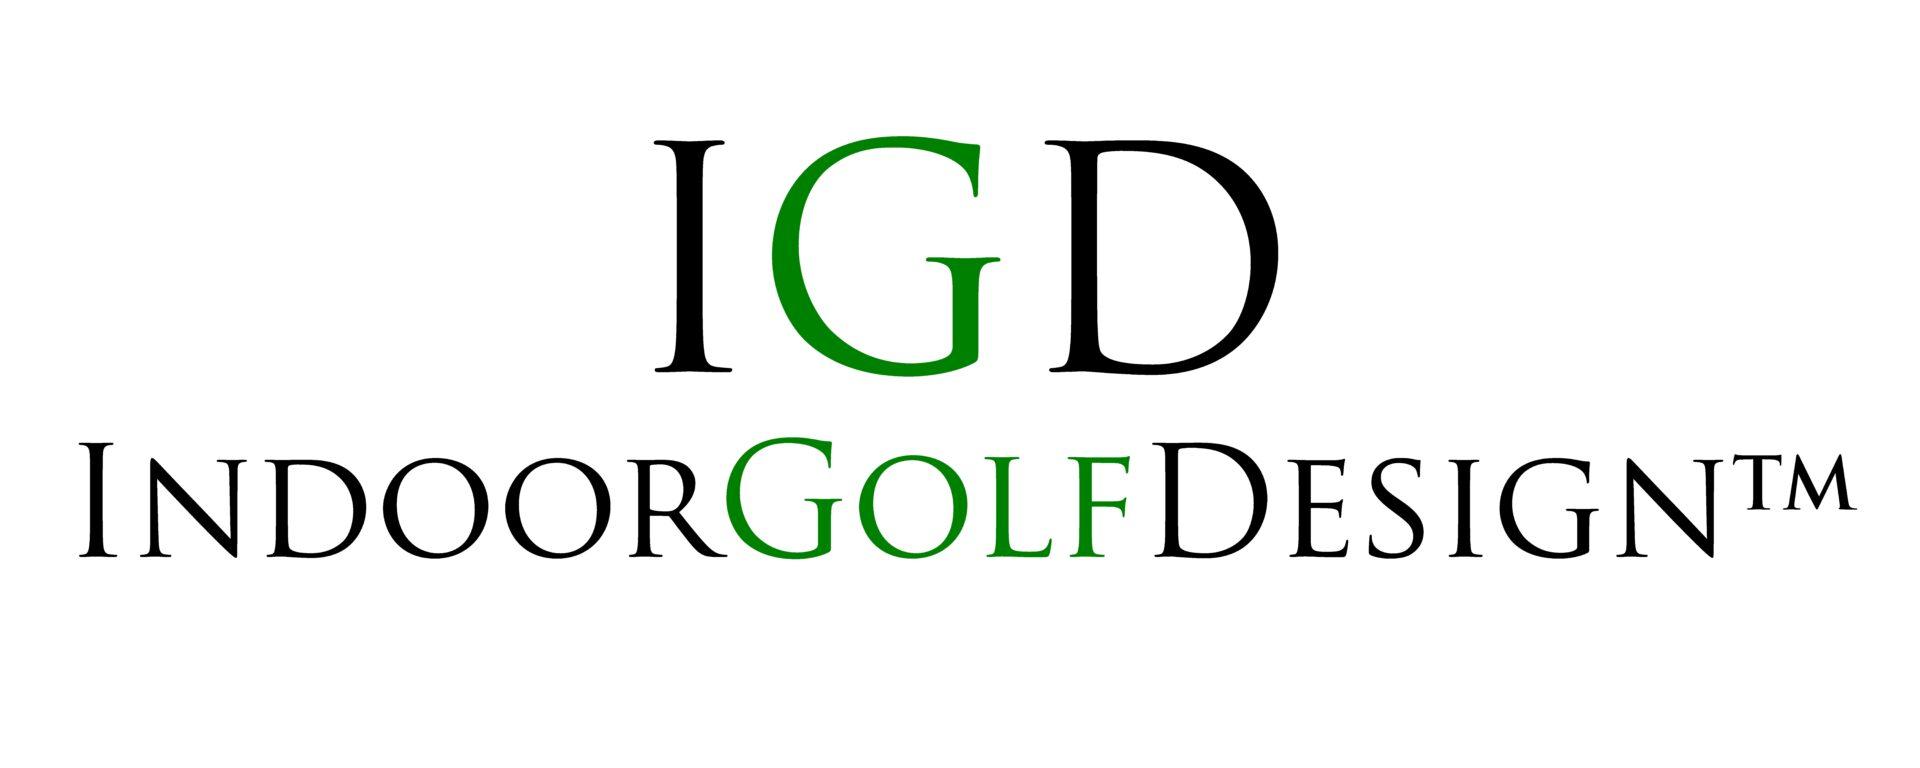 indoor golf design logo